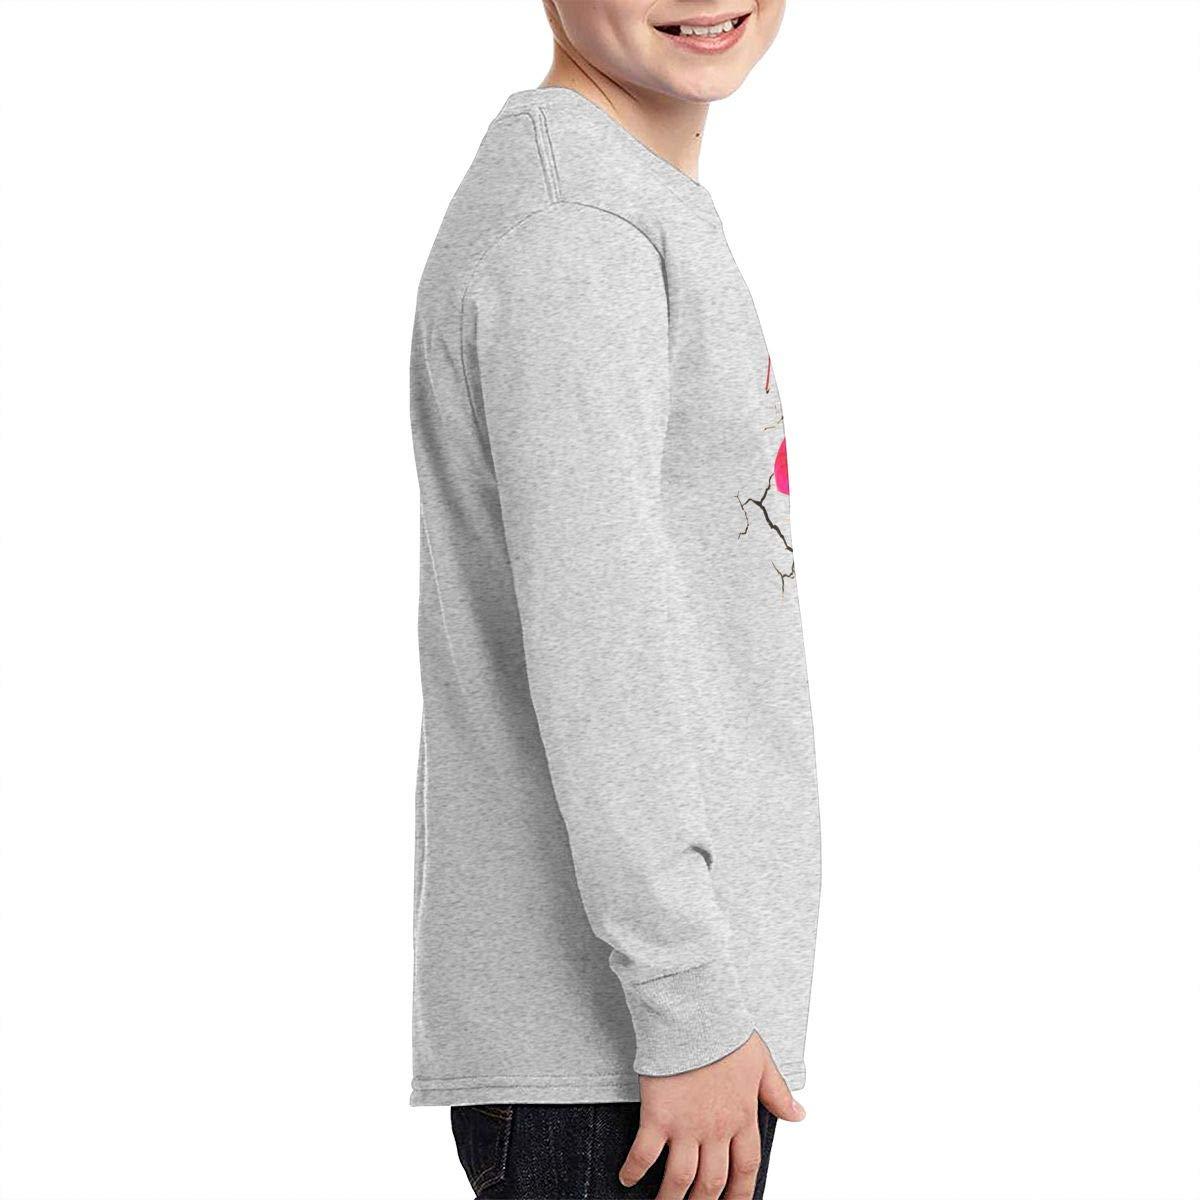 TWOSKILL Youth Pink-P!nk Long Sleeves Shirt Boys Girls